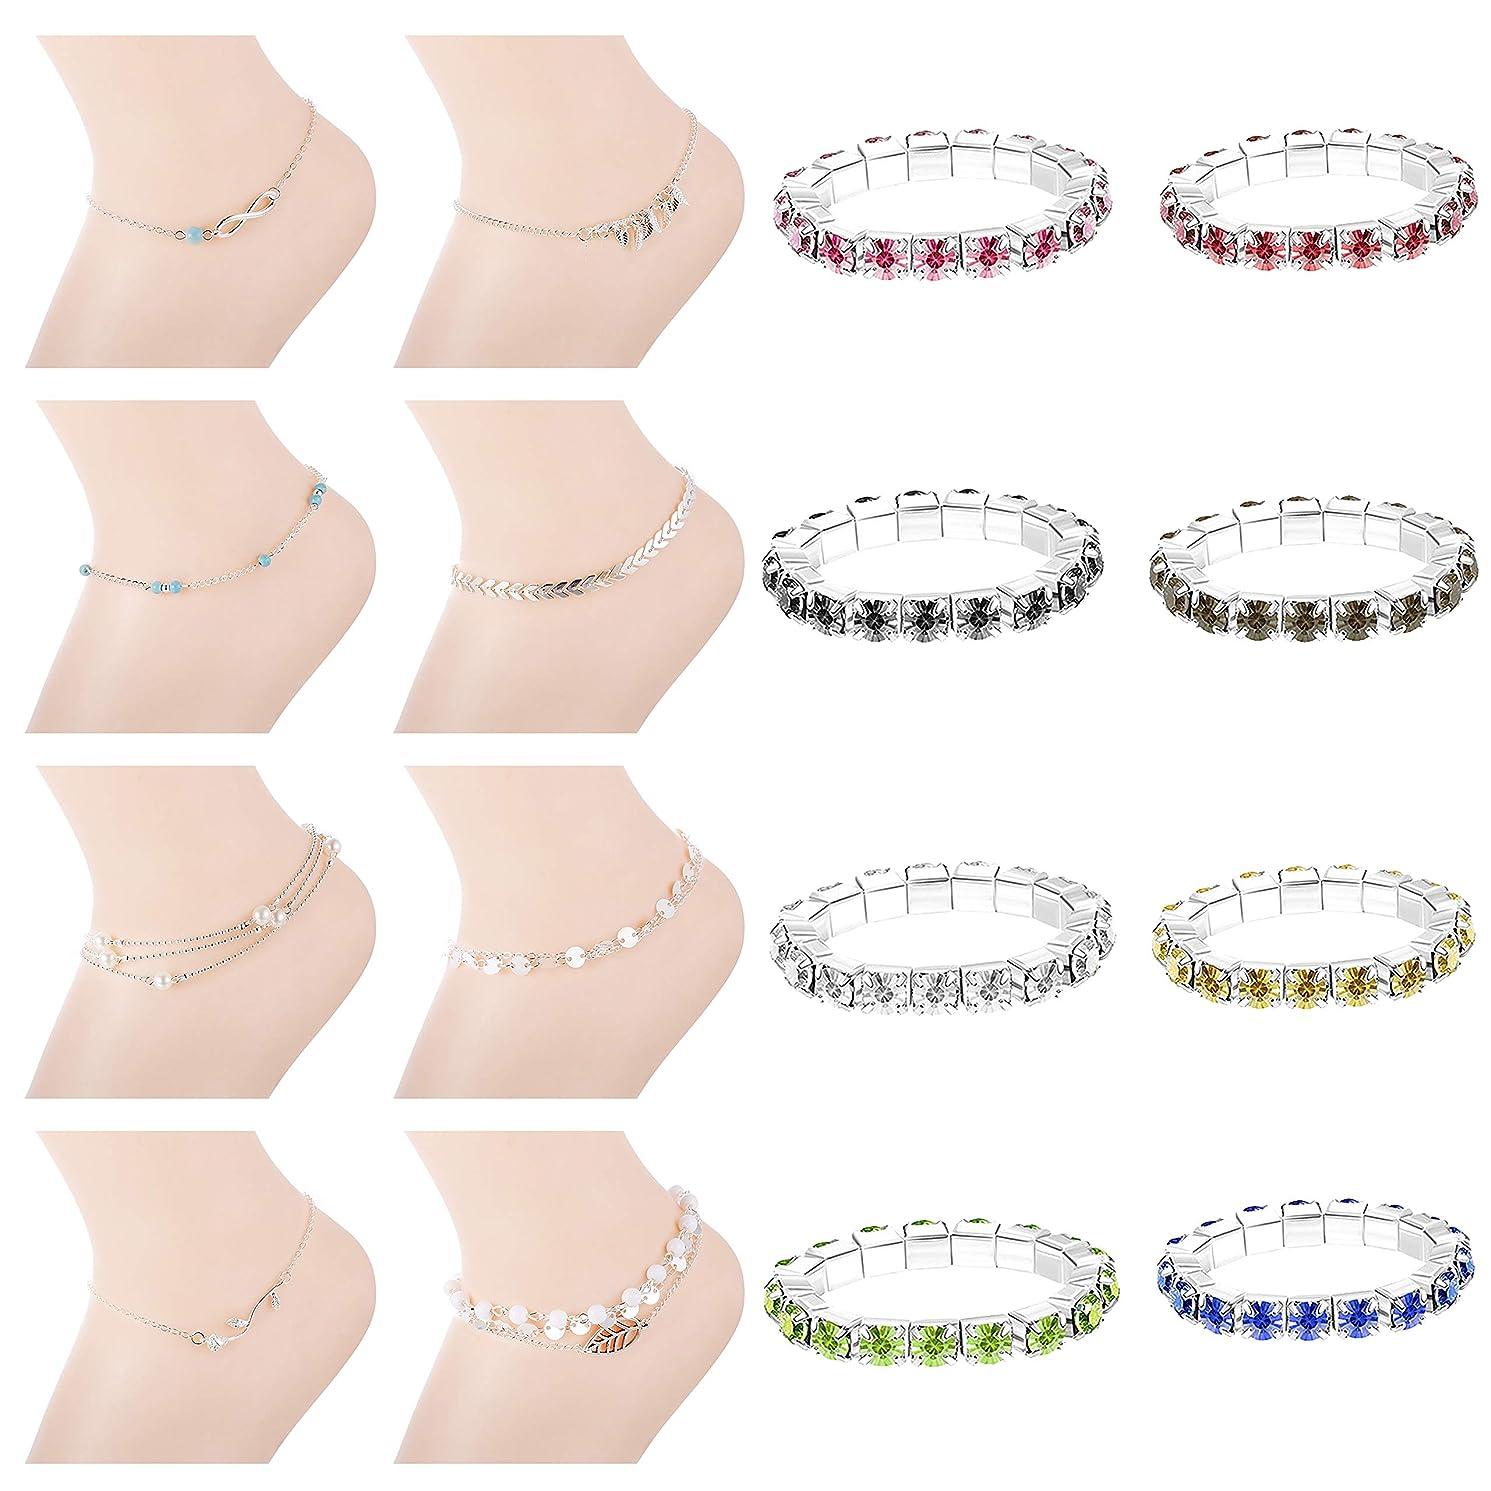 LOYALLOOK 2-16PCS Women Anklet Elastic Crystal Toe Rings Set Women Girls Beach Ankle Chains Bracelets Set Anklet Foot Jewelry for Women